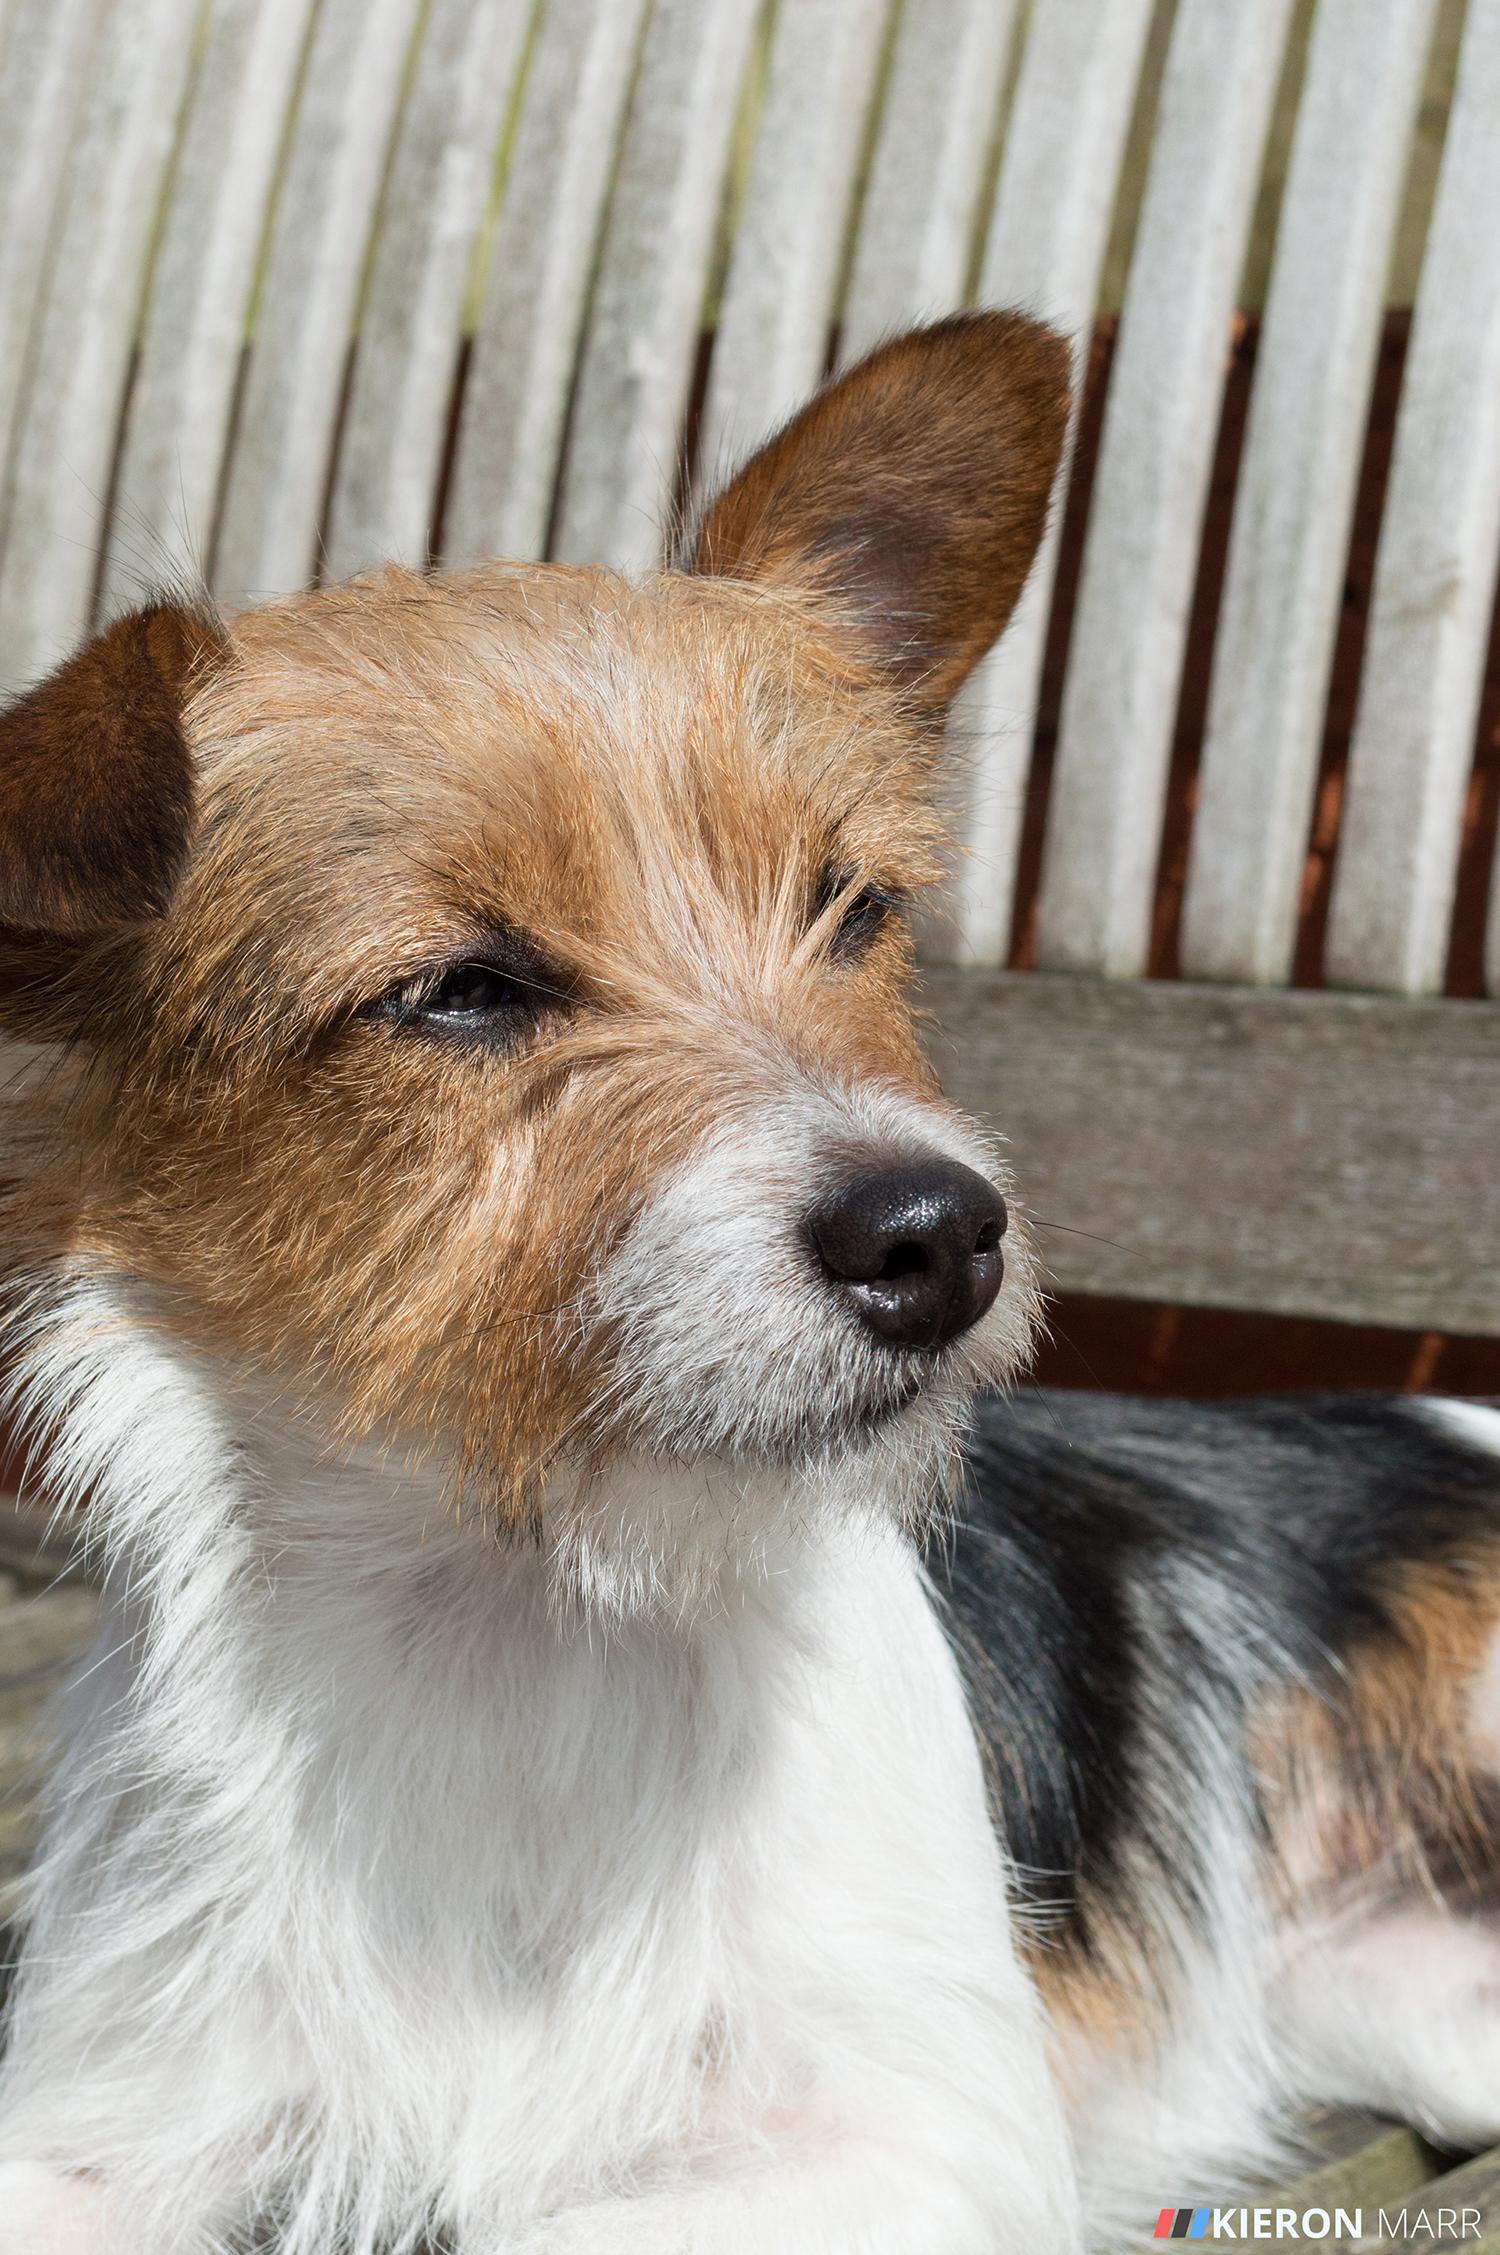 Maisie sunbathing on a bench